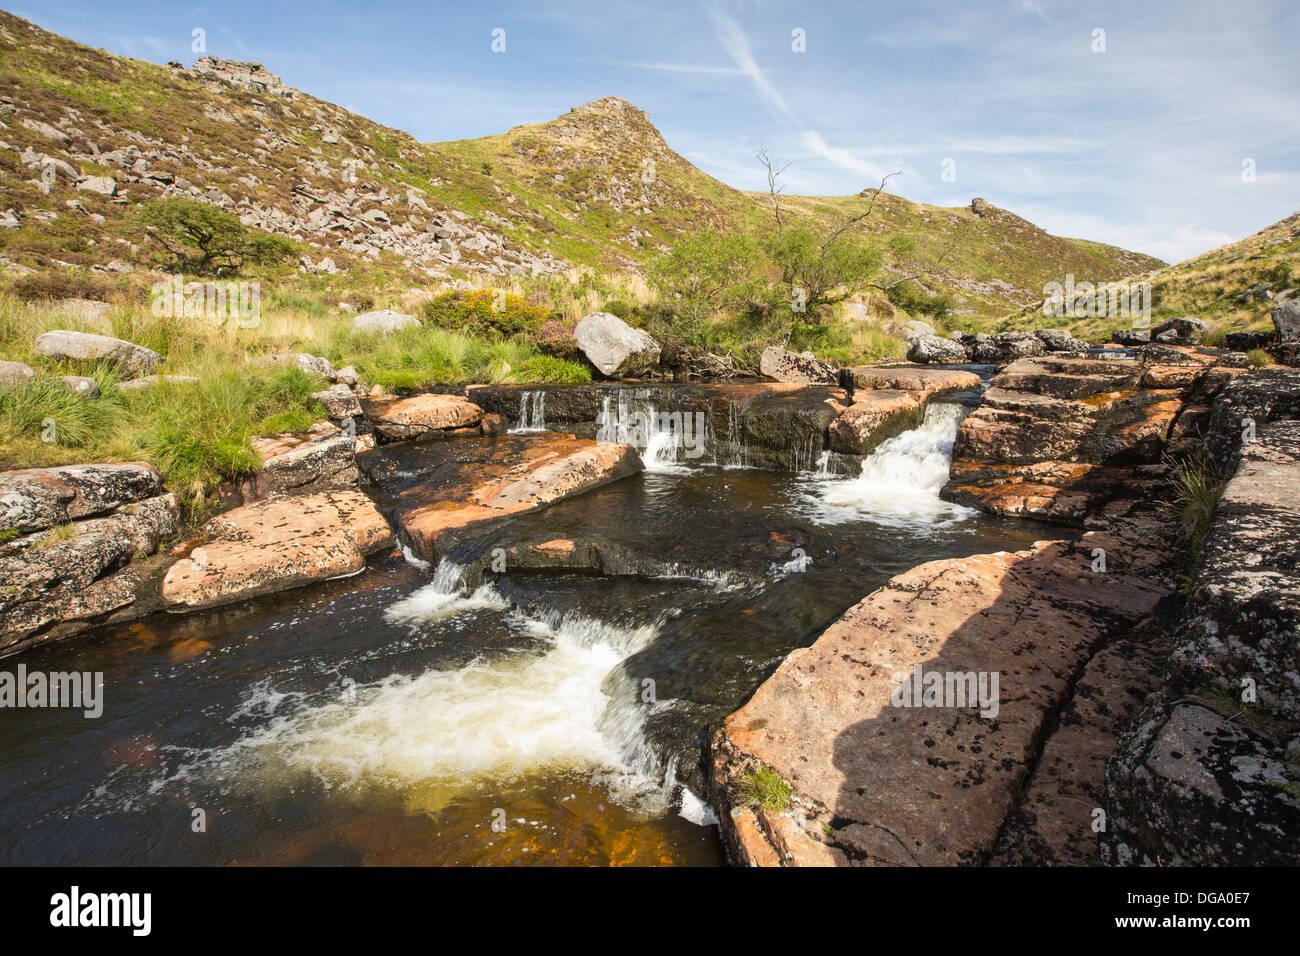 The river Tavy on Dartmoor, Devon, UK. - Stock Image